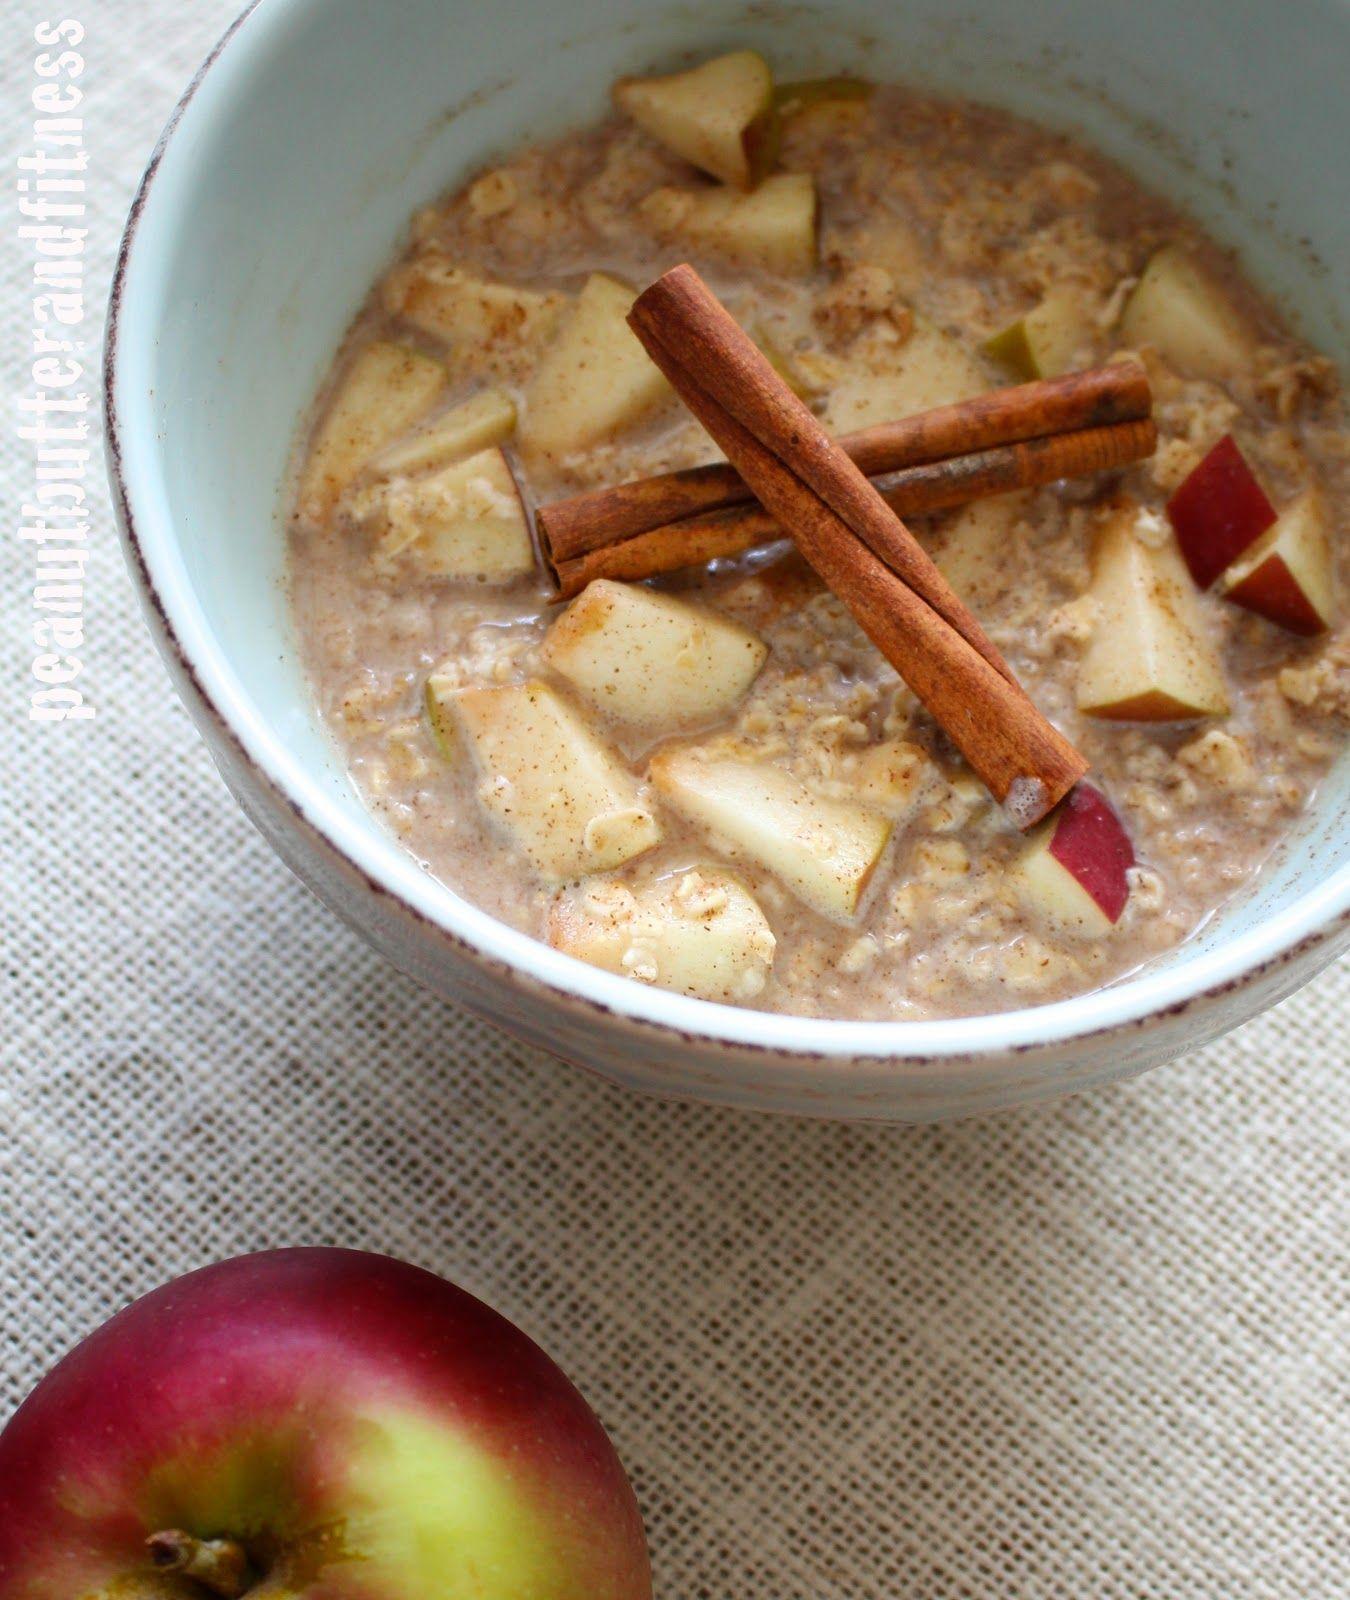 Apple cinnamon oatmeal cinnamon oatmeal apple cinnamon